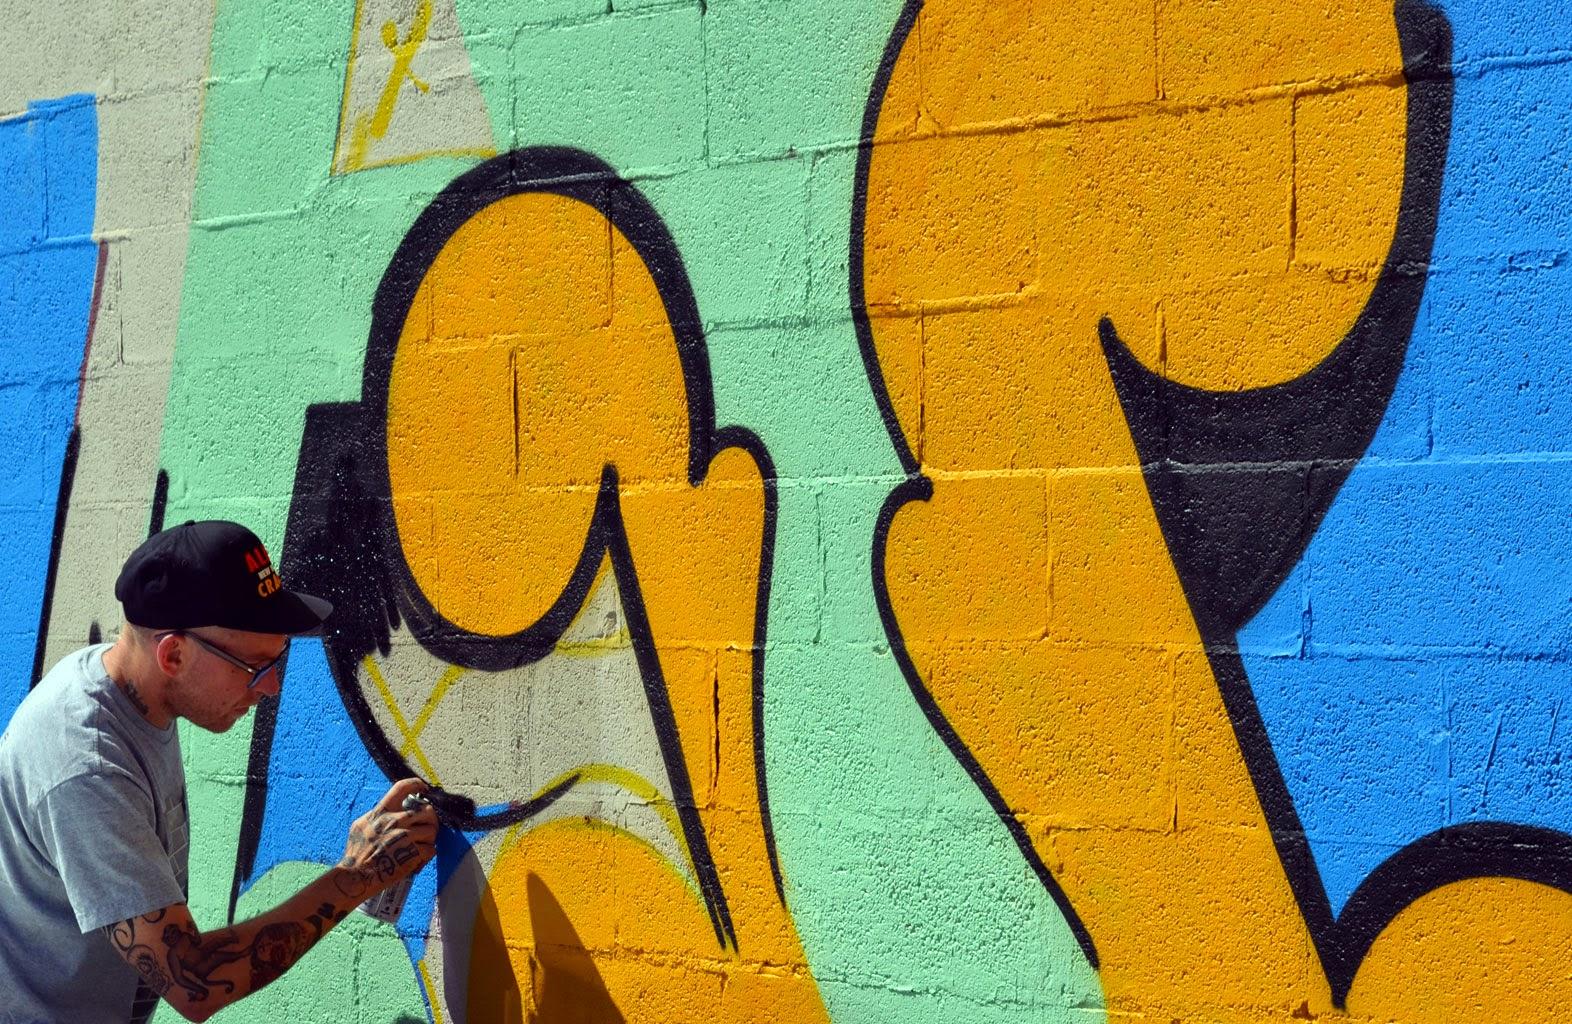 Ben Eine New Mural - Denver, Colorado   StreetArtNews   StreetArtNews